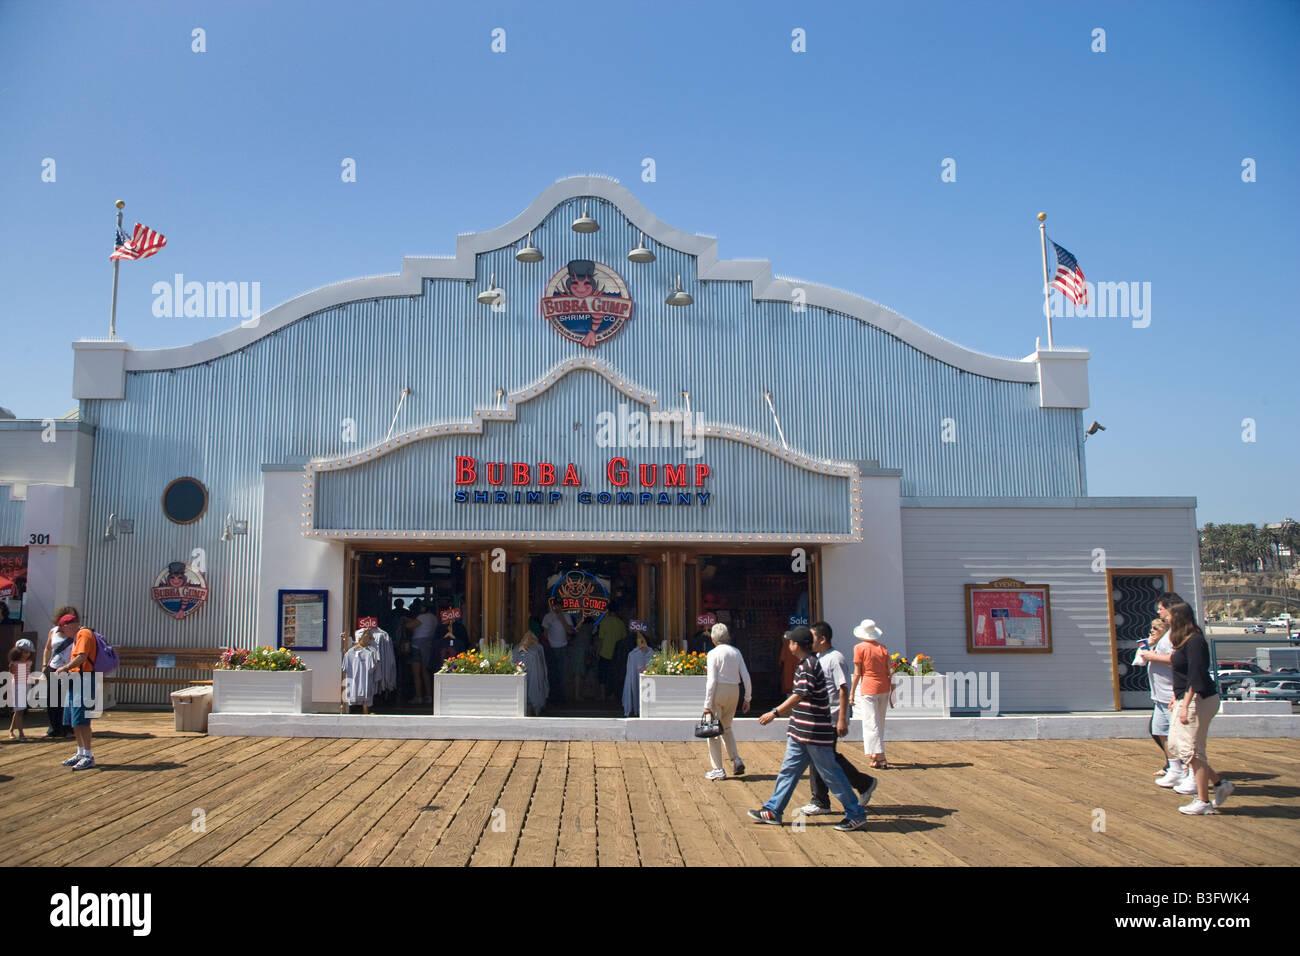 Bubba Gumps Seafood Restaurant Santa Monica Pier Los Angeles Stock